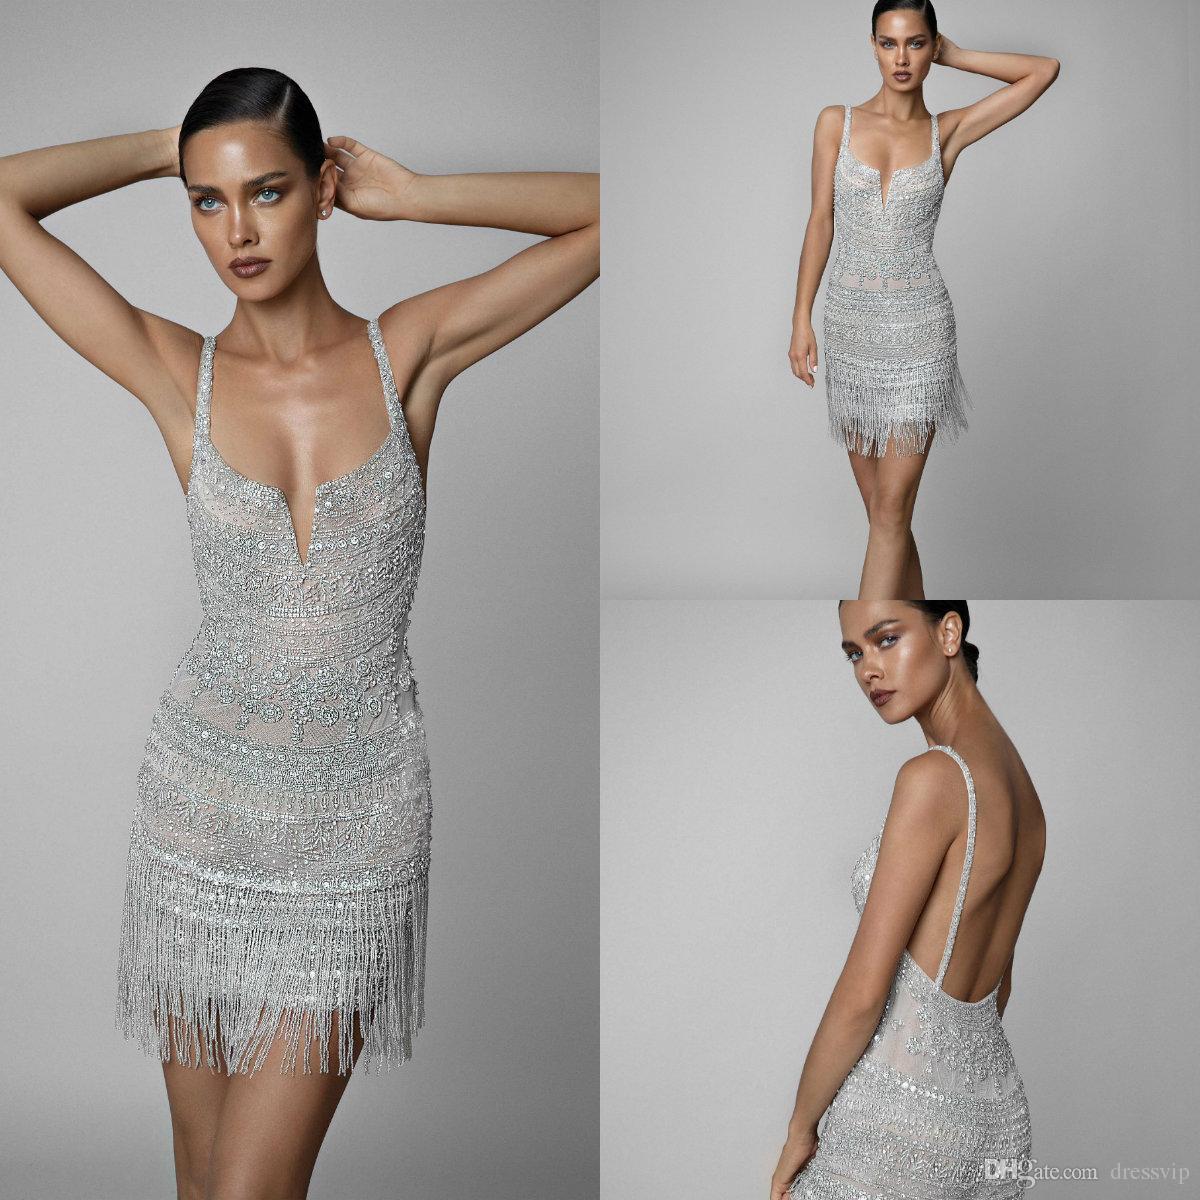 e4c7e6cefa7a8 Berta Bridal Bridal Dresses | One Enchanted Evening